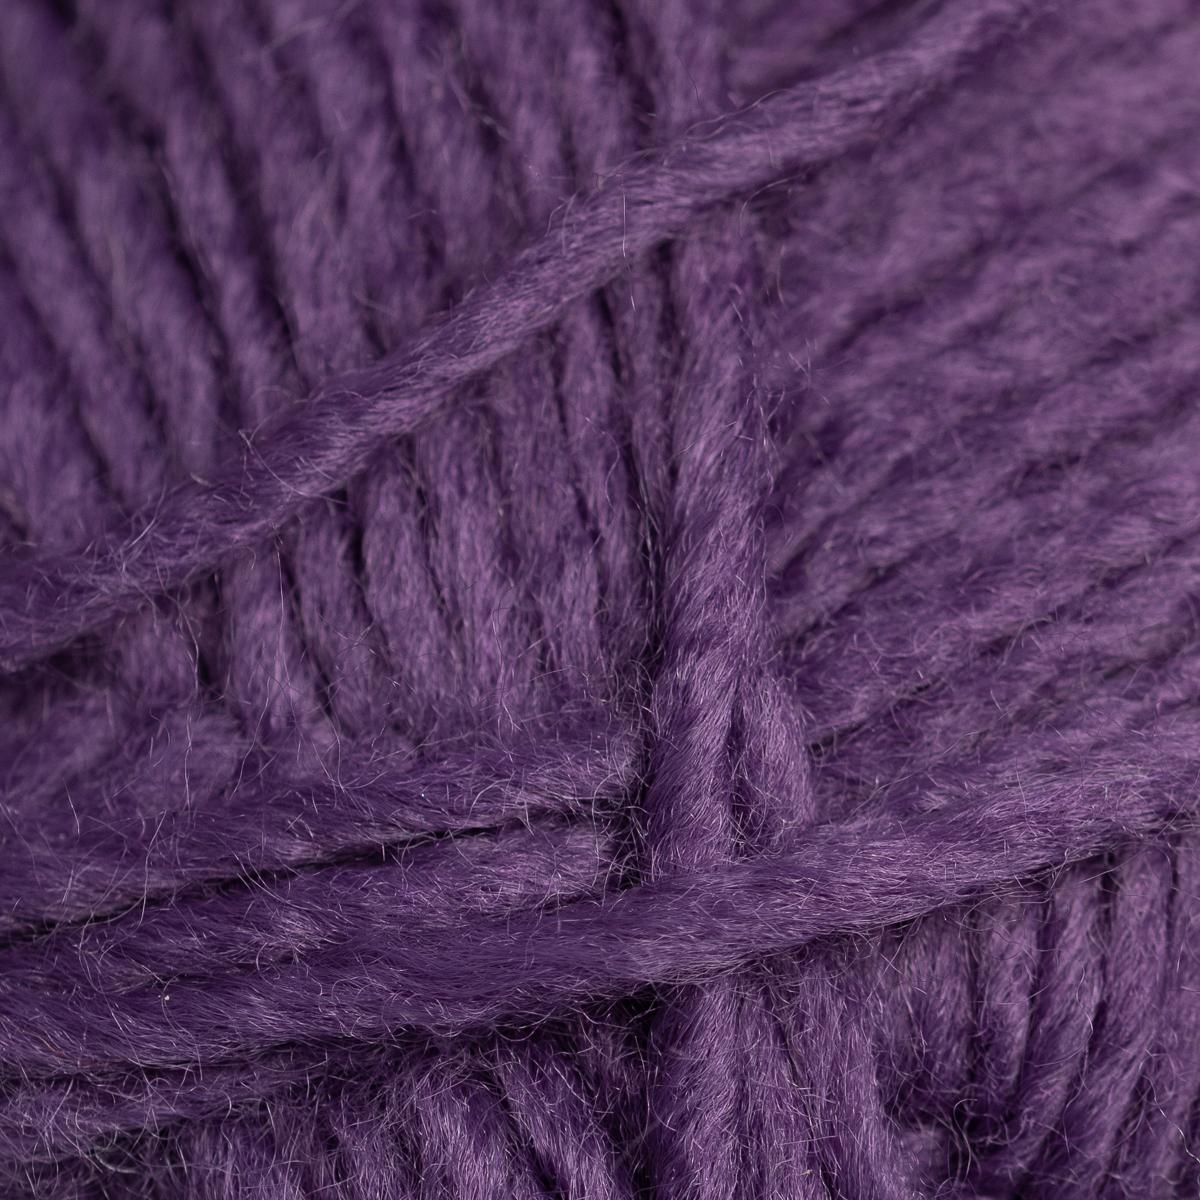 3pk-Lion-Brand-New-Basic-Acrylic-amp-Wool-Yarn-Medium-4-Knit-Crochet-Skeins-Soft thumbnail 39